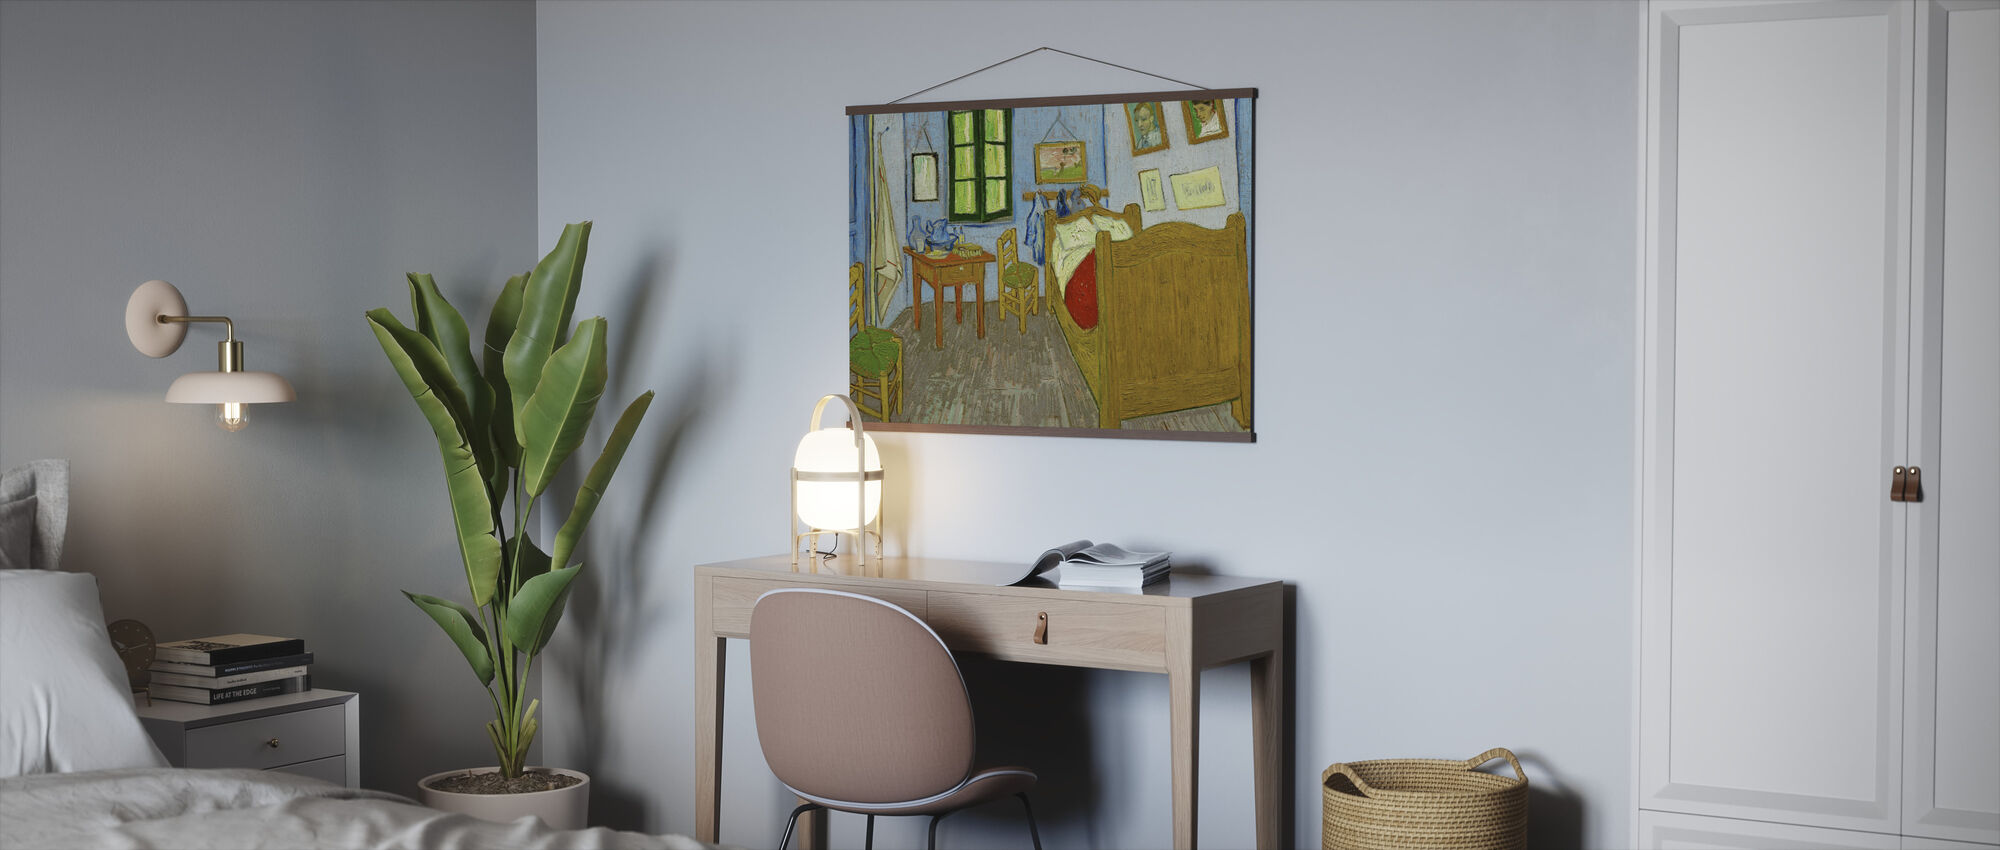 Vincent van Gogh - Arles - Plakat - Kontor